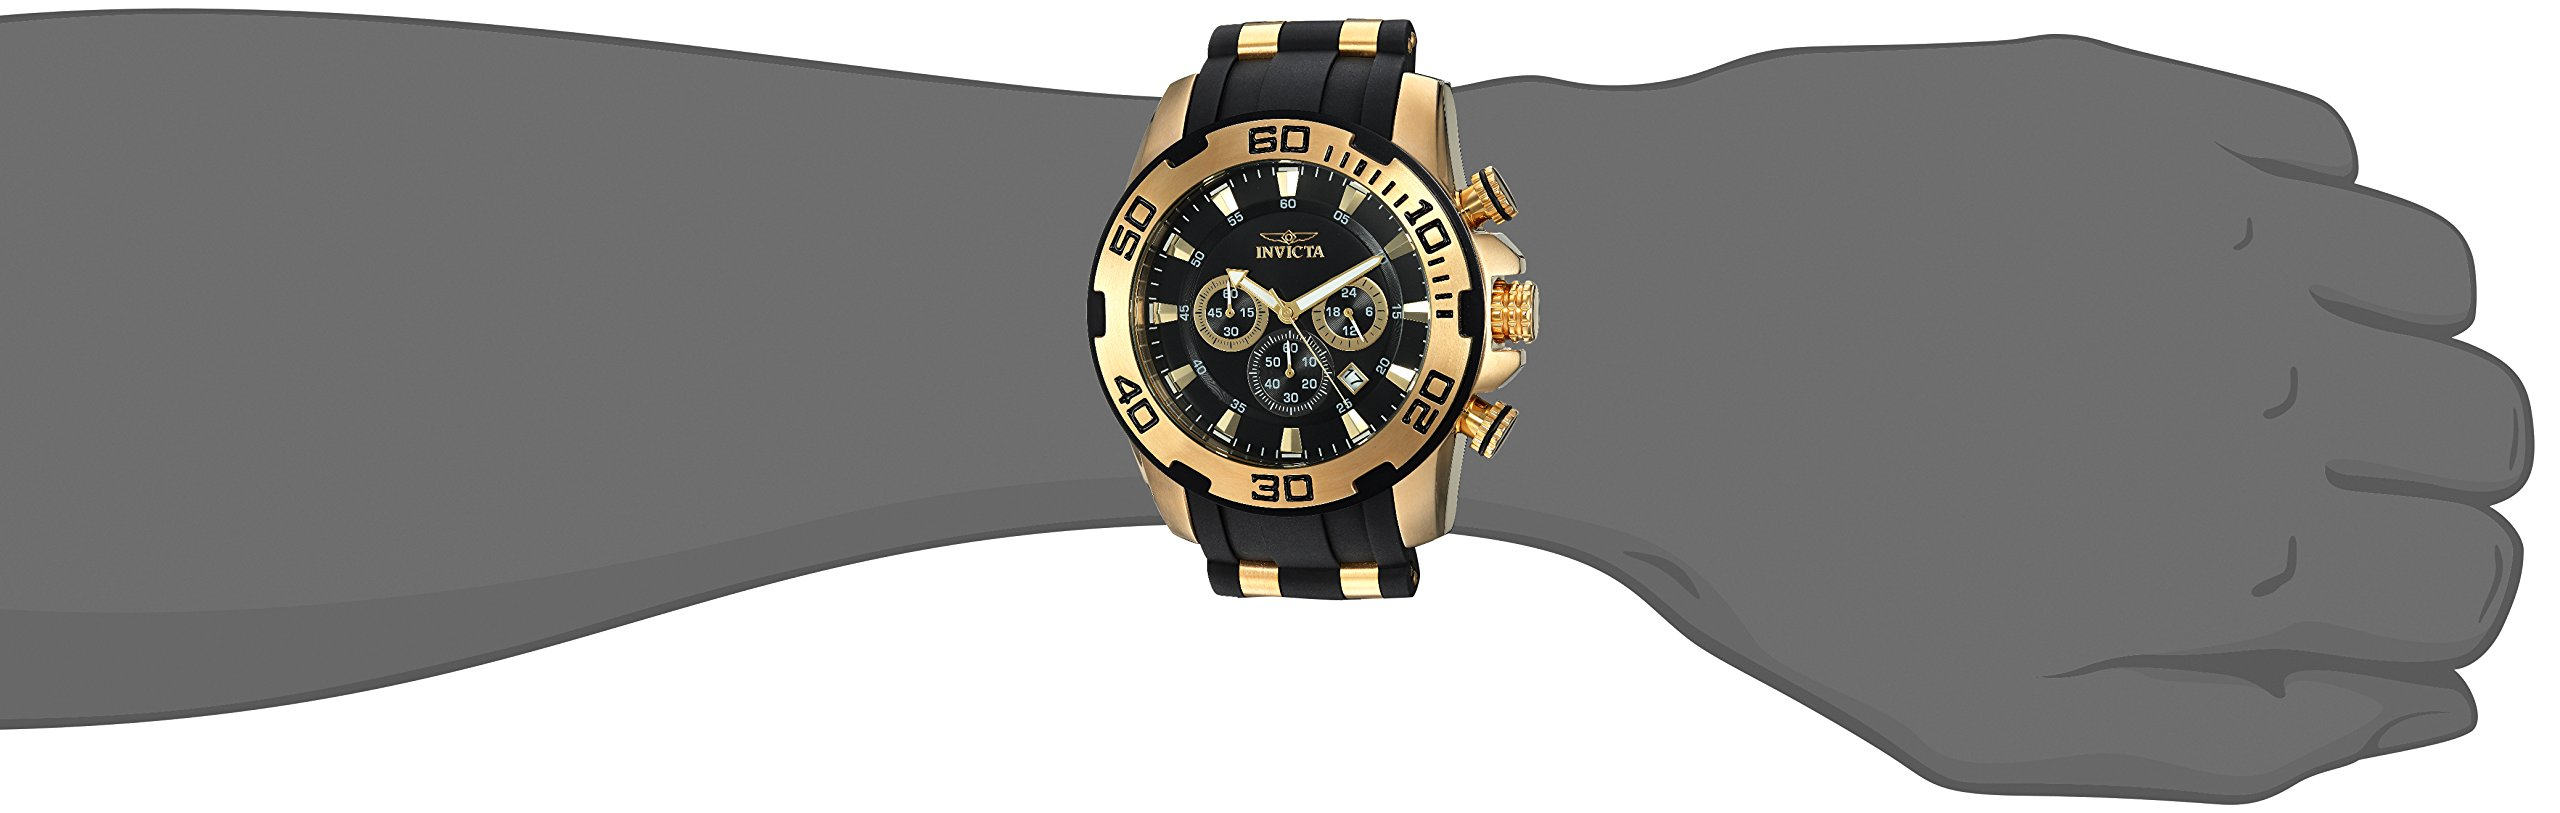 Invicta Men's Pro Diver Stainless Steel Quartz Watch with Silicone Strap, Black, 25 (Model: 22340 by Invicta (Image #2)